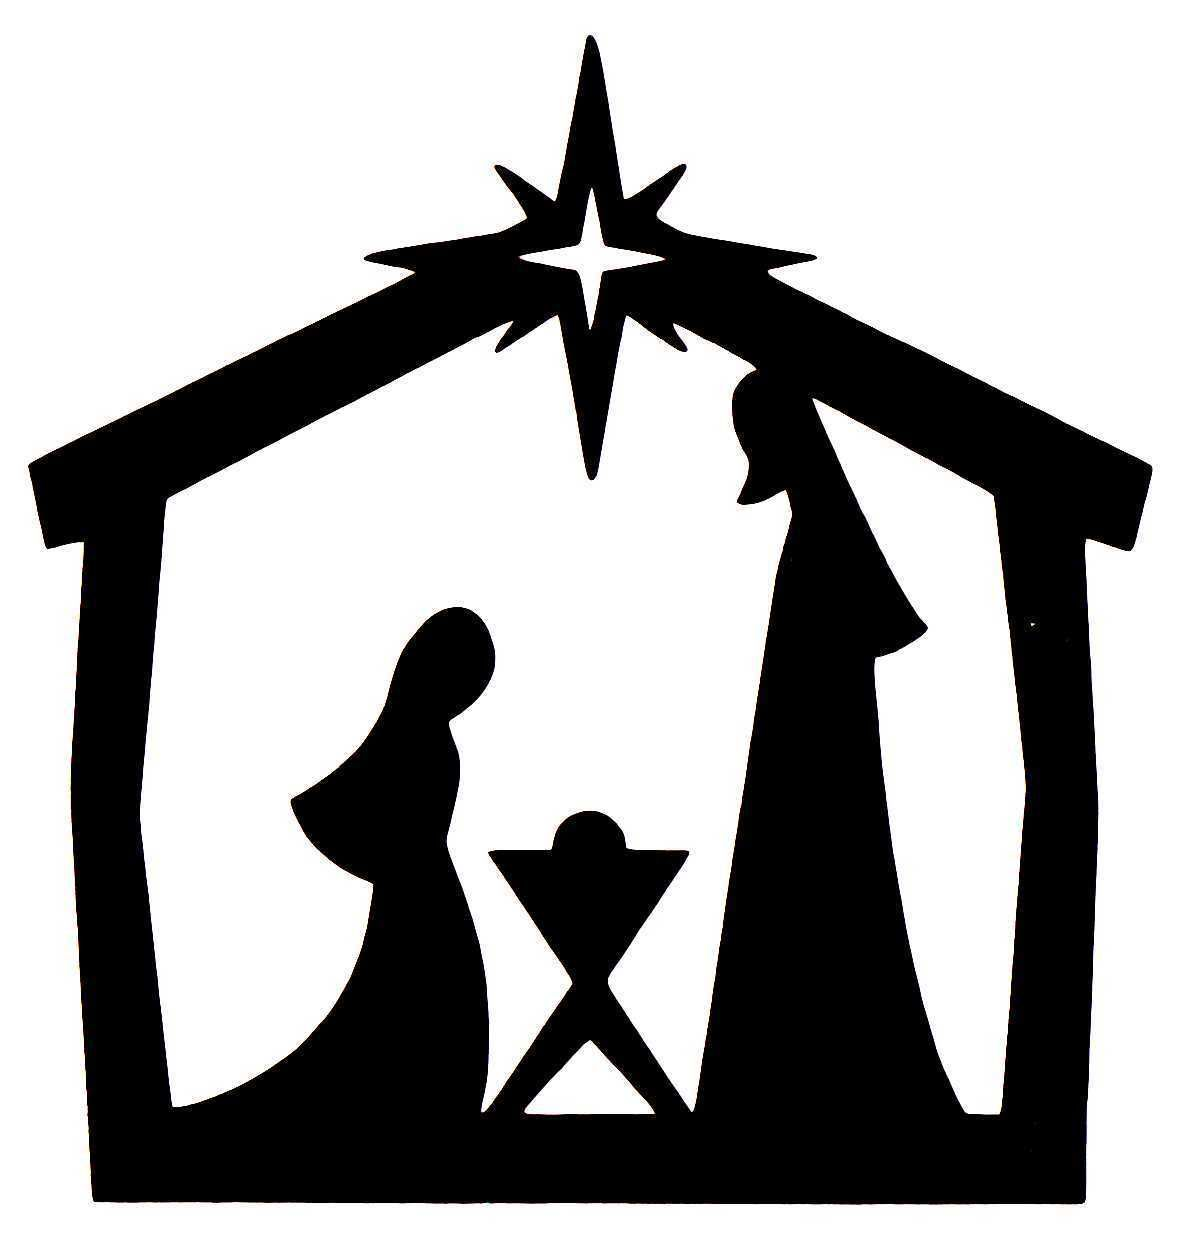 Nativity scene clipart silhouette 7 » Clipart Station.